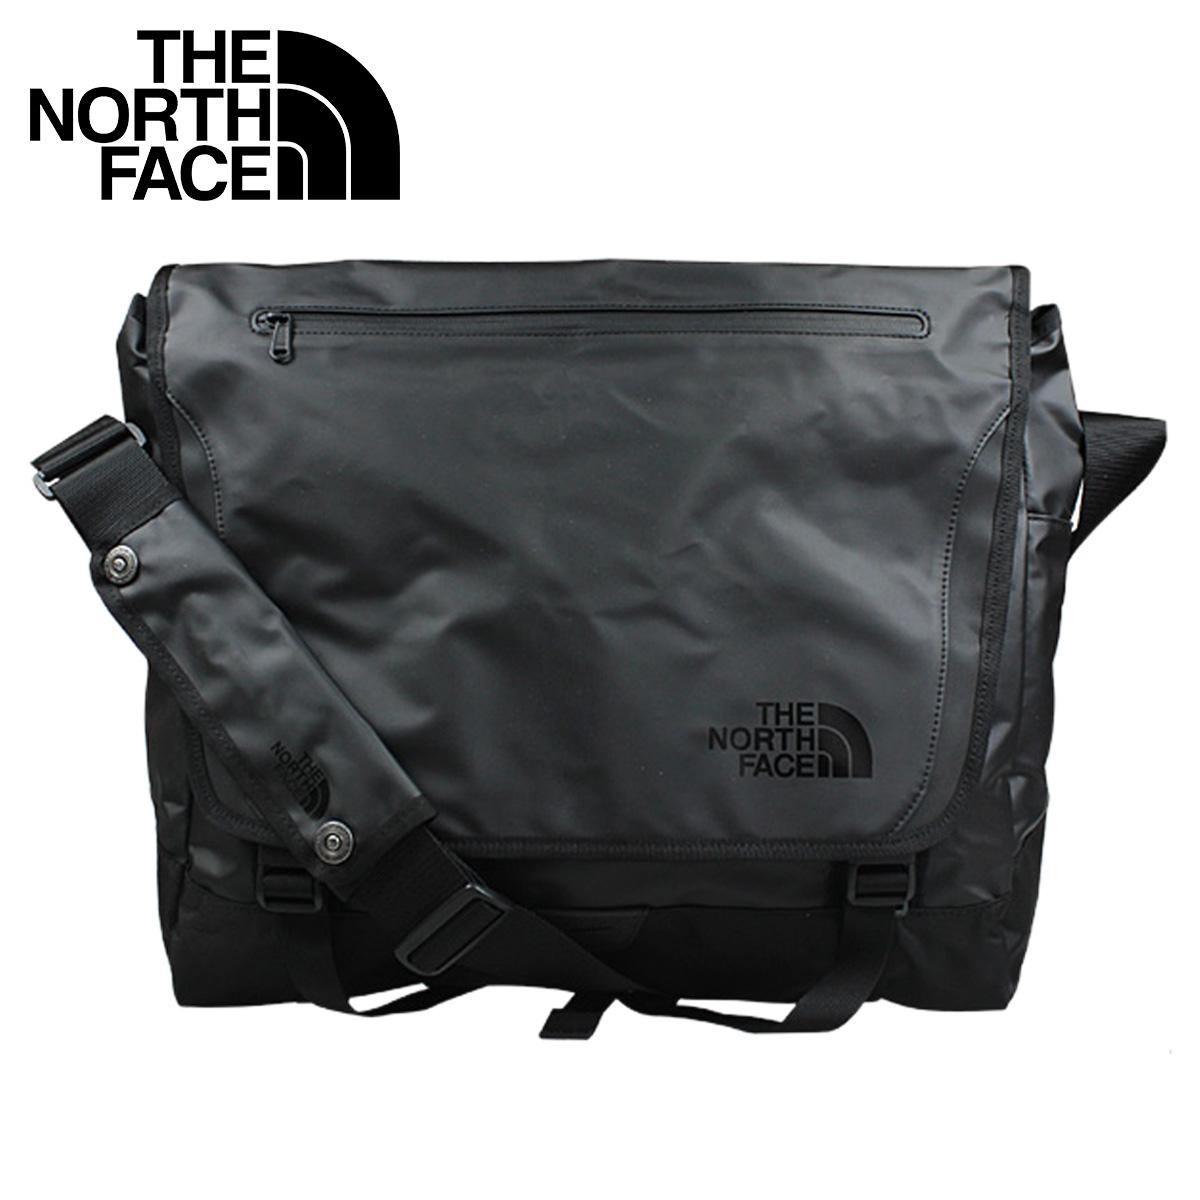 sneak online shop the north face the north face messenger. Black Bedroom Furniture Sets. Home Design Ideas